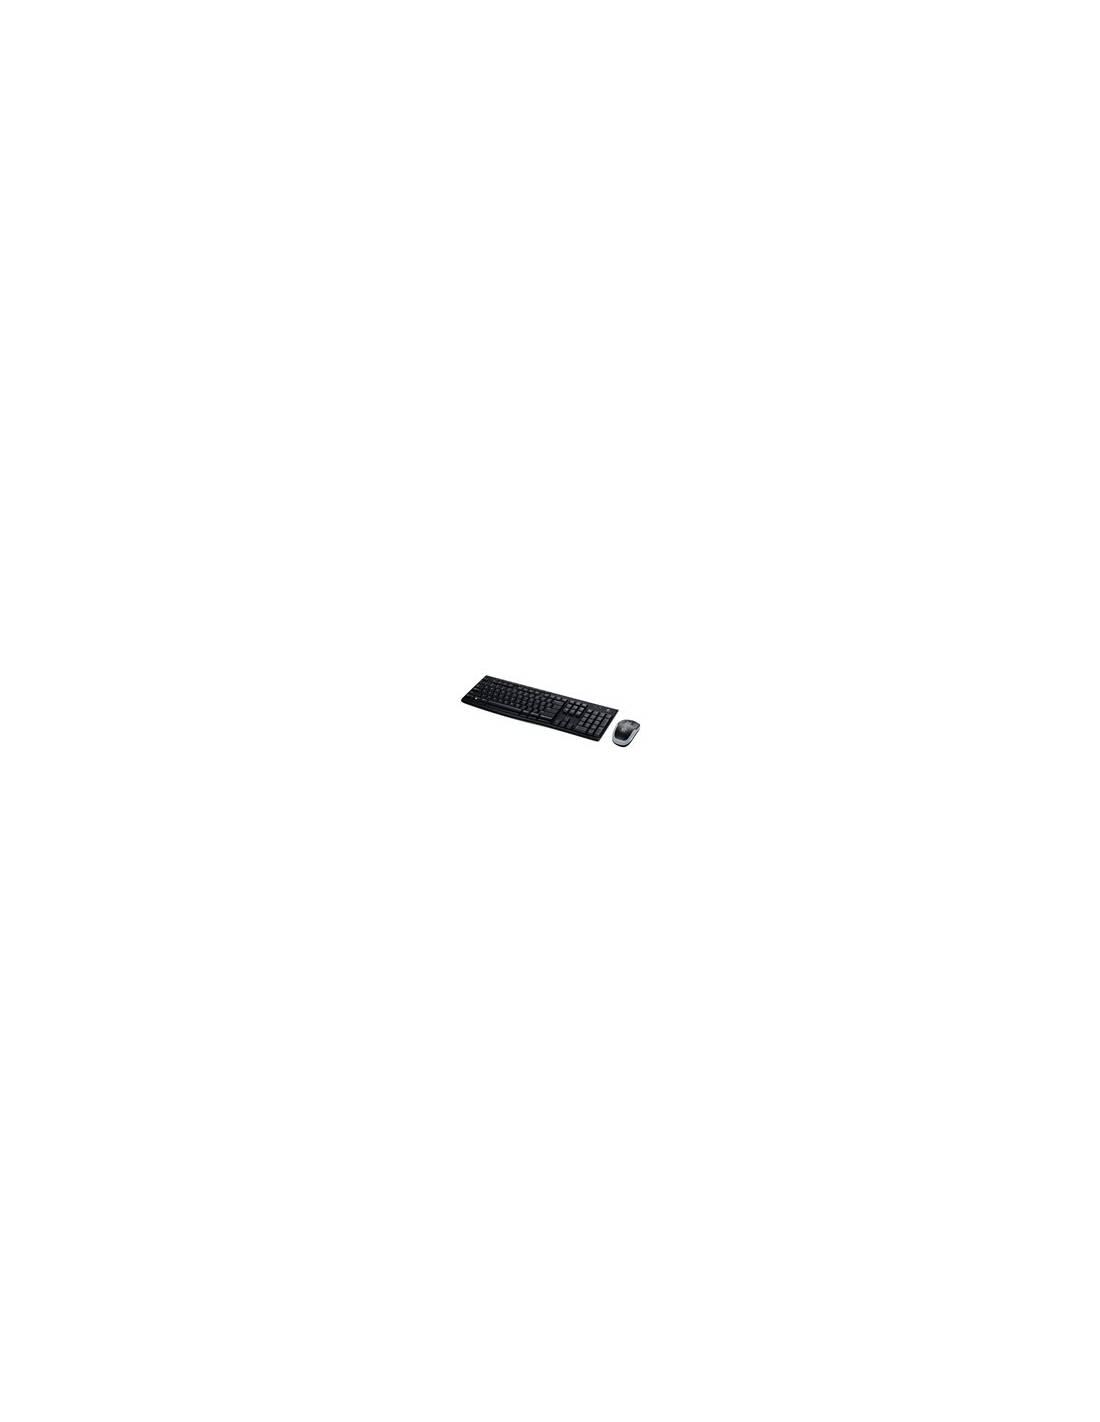 Logitech MK270 Negro Teclado y Ratón Wireless